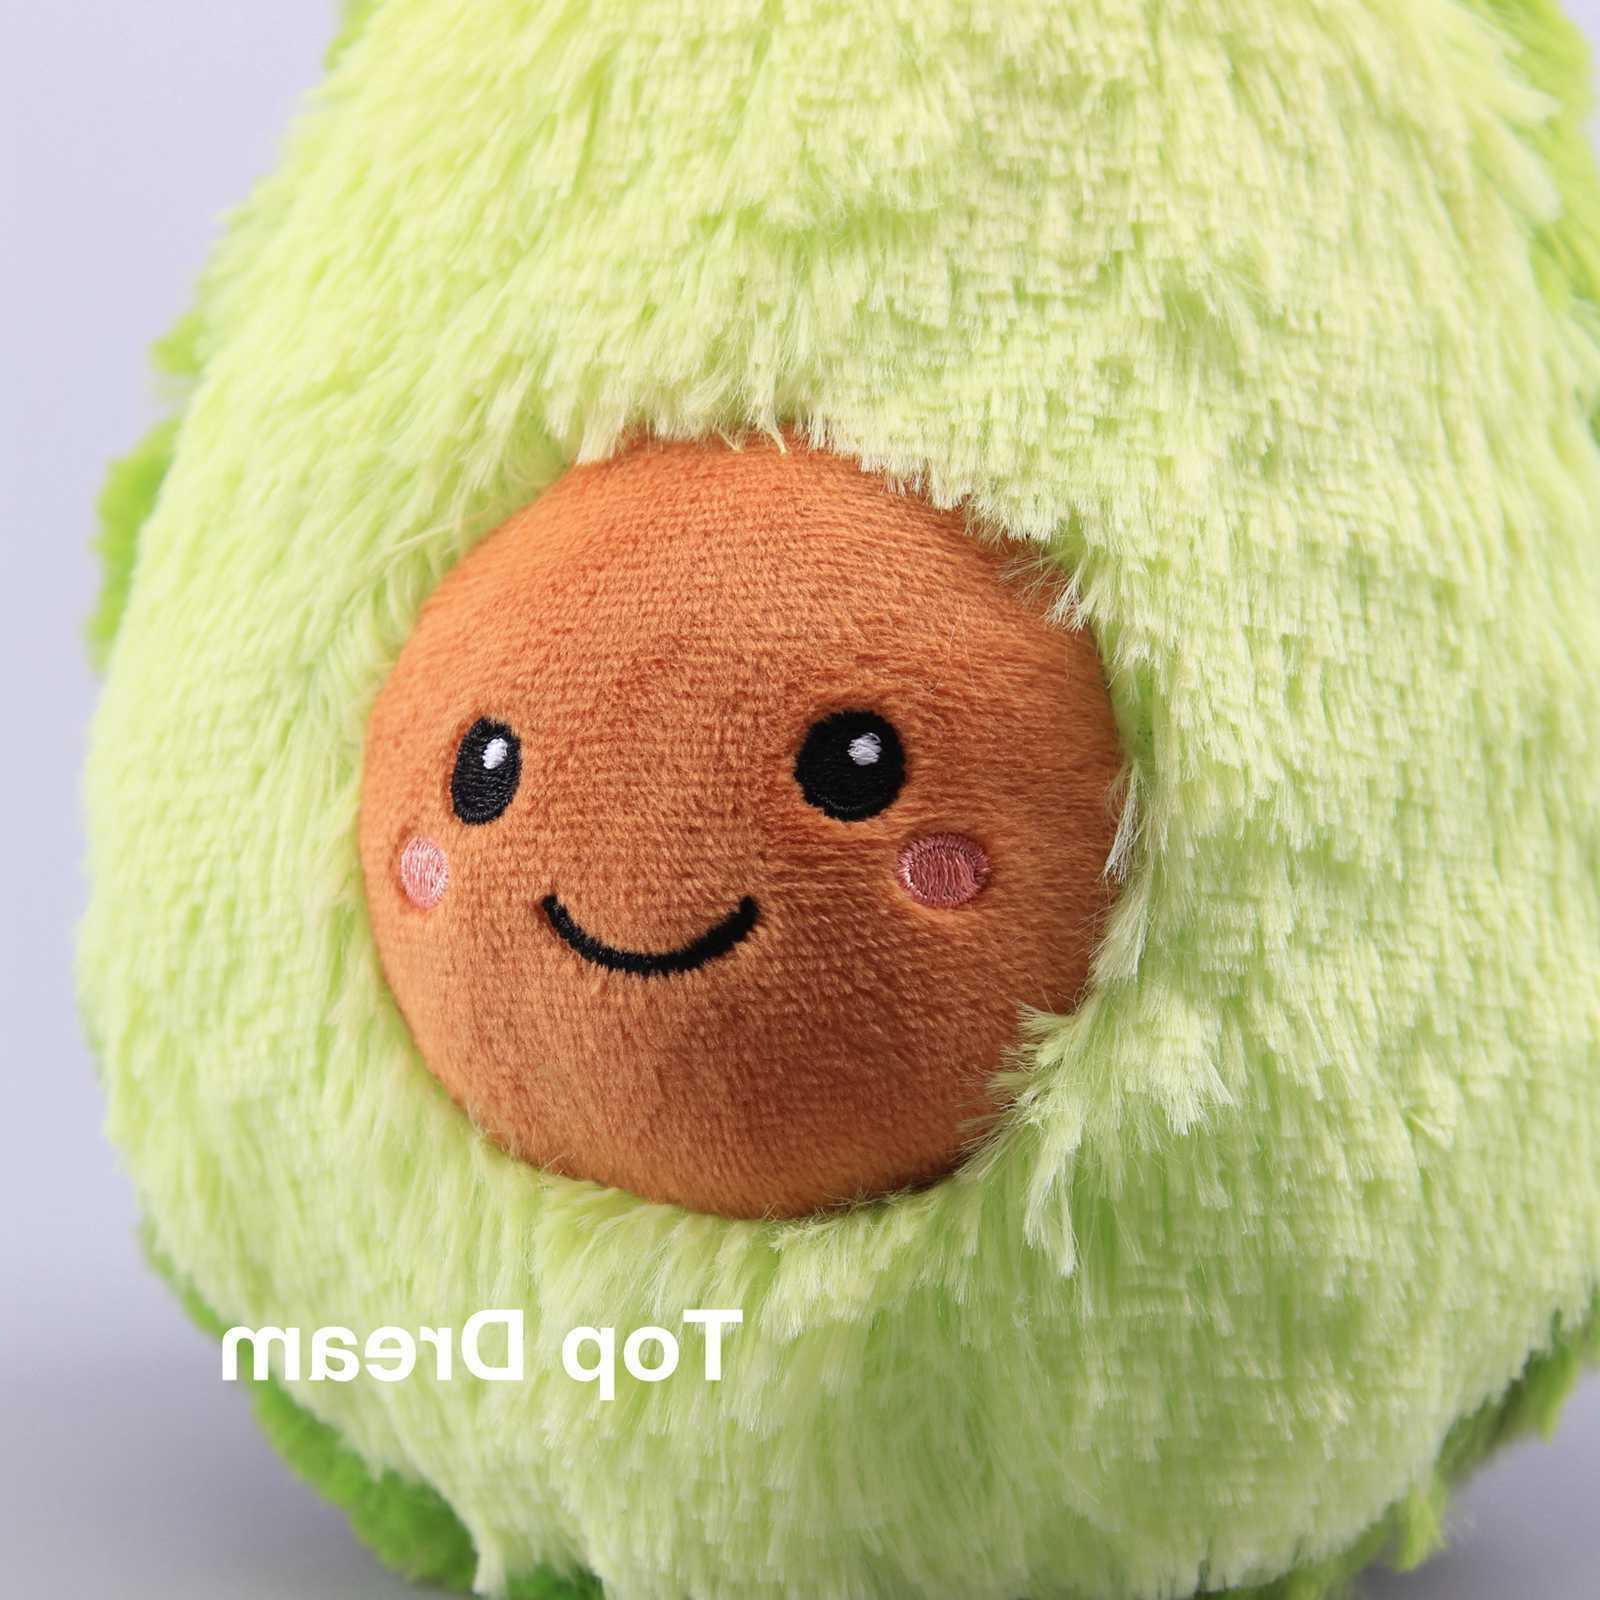 Baby Toy Avocado Fruit Plush Soft Great